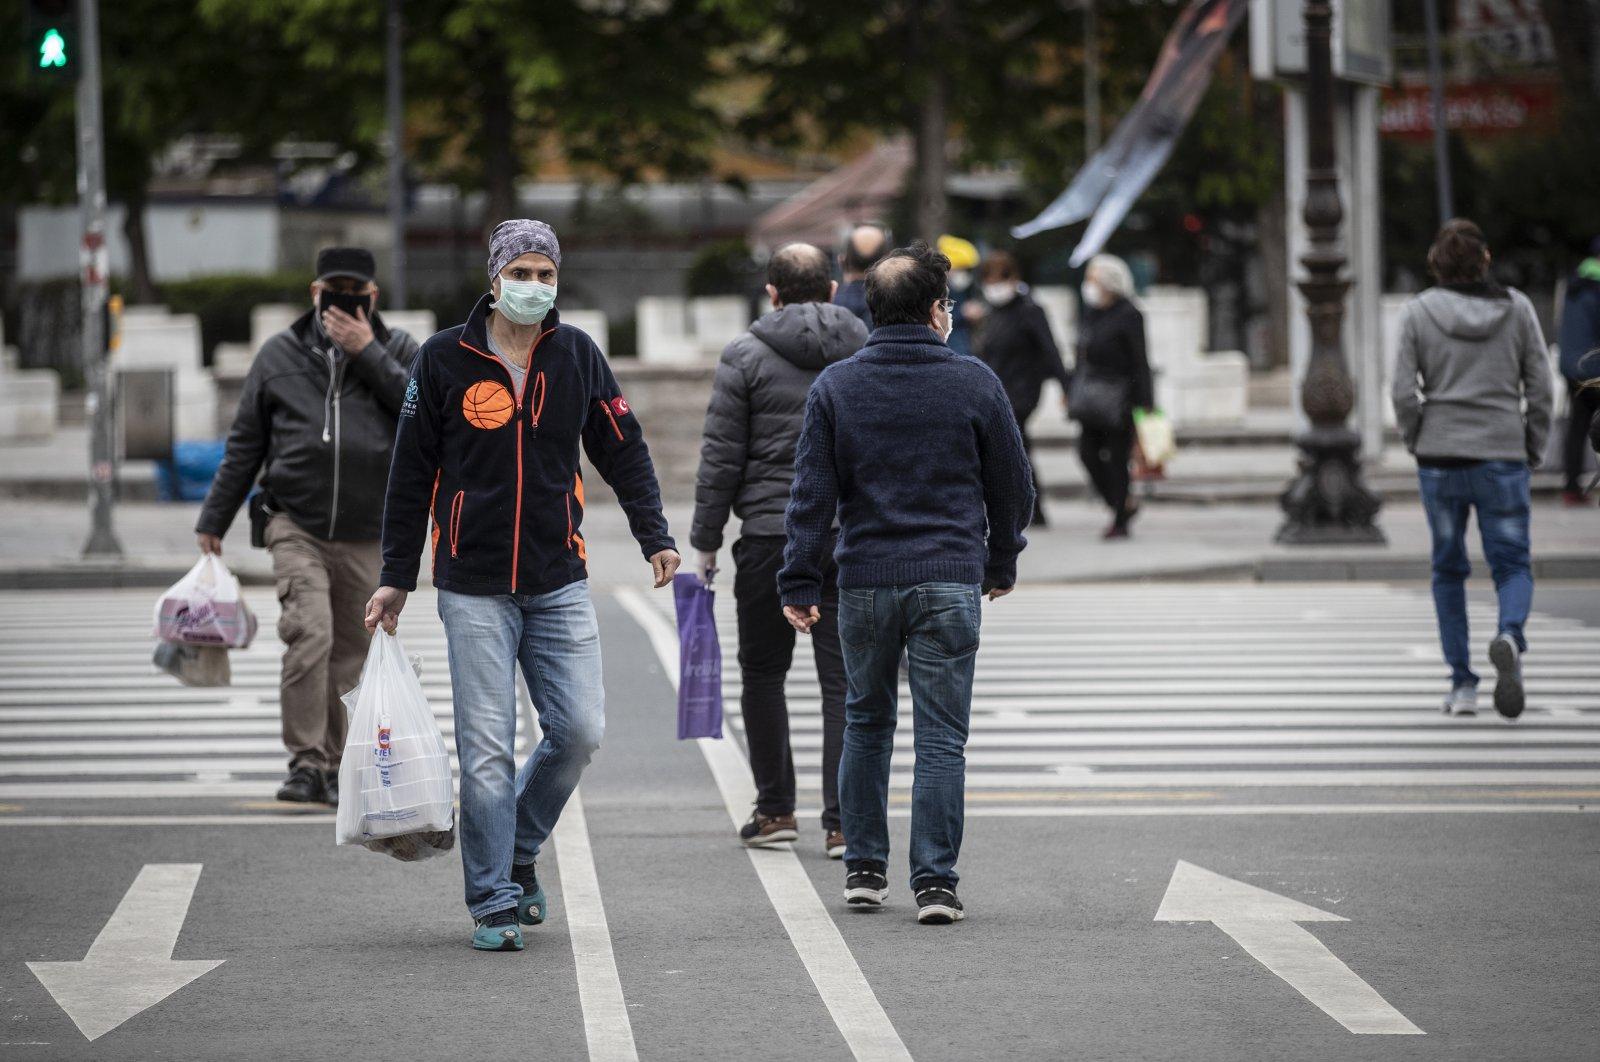 People wearing masks walk the streets of the capital Ankara, Turkey, April 23, 2020. (AA Photo)